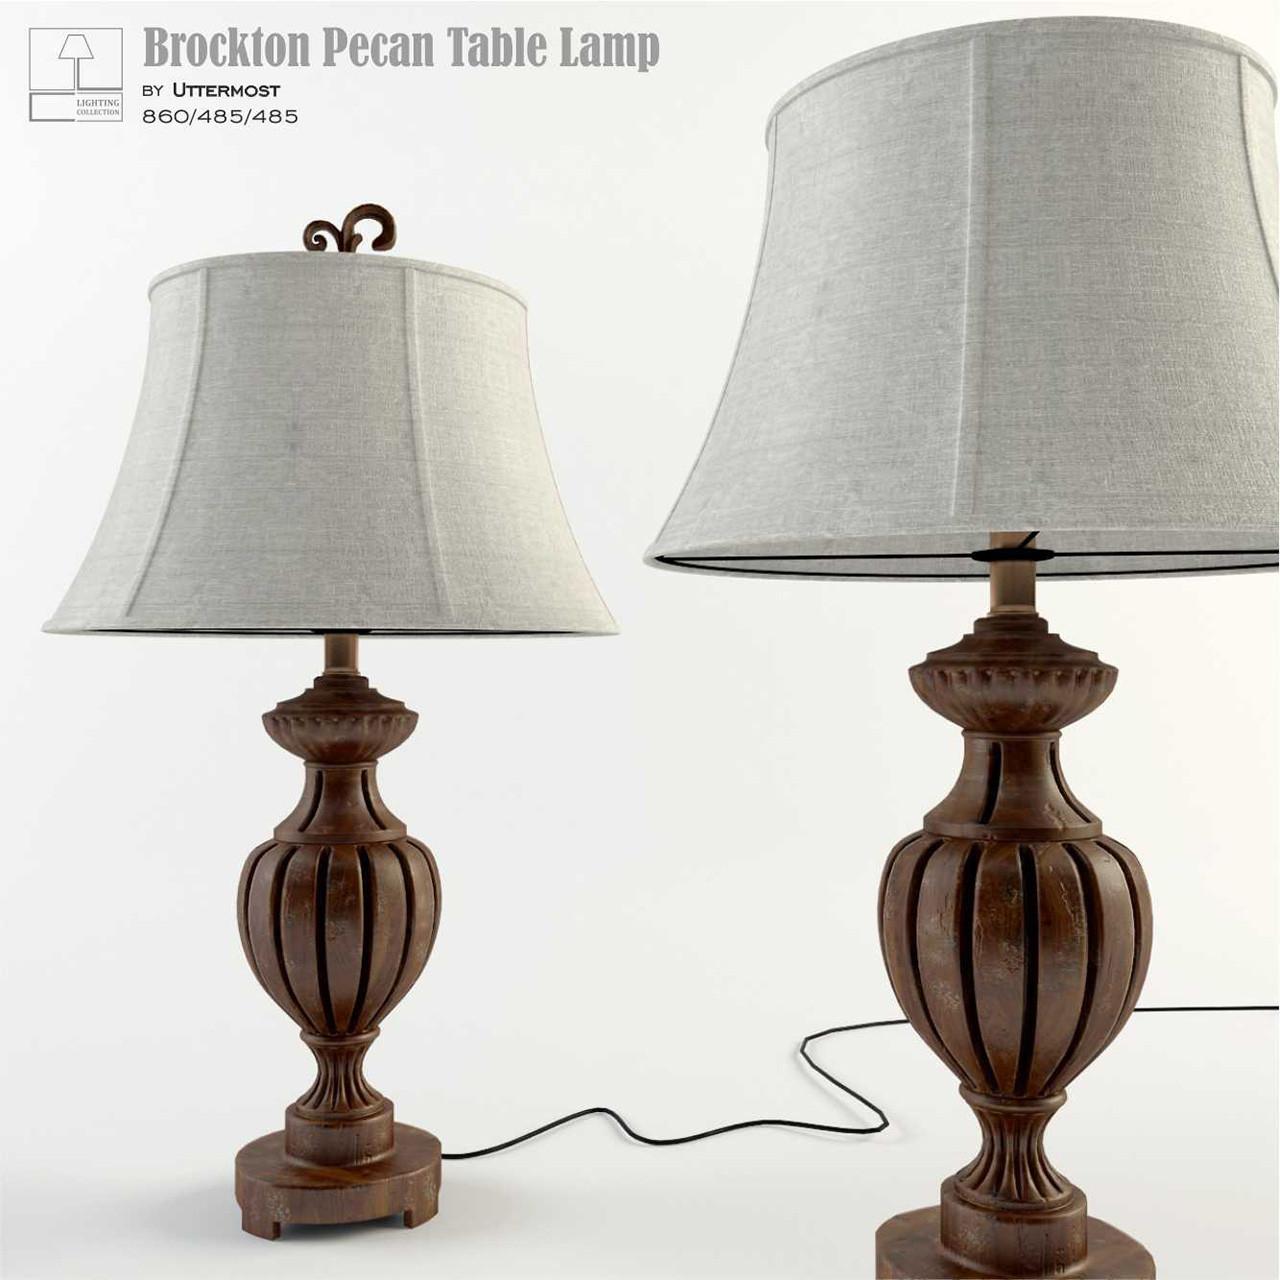 Brockton Pecan Table Lamp